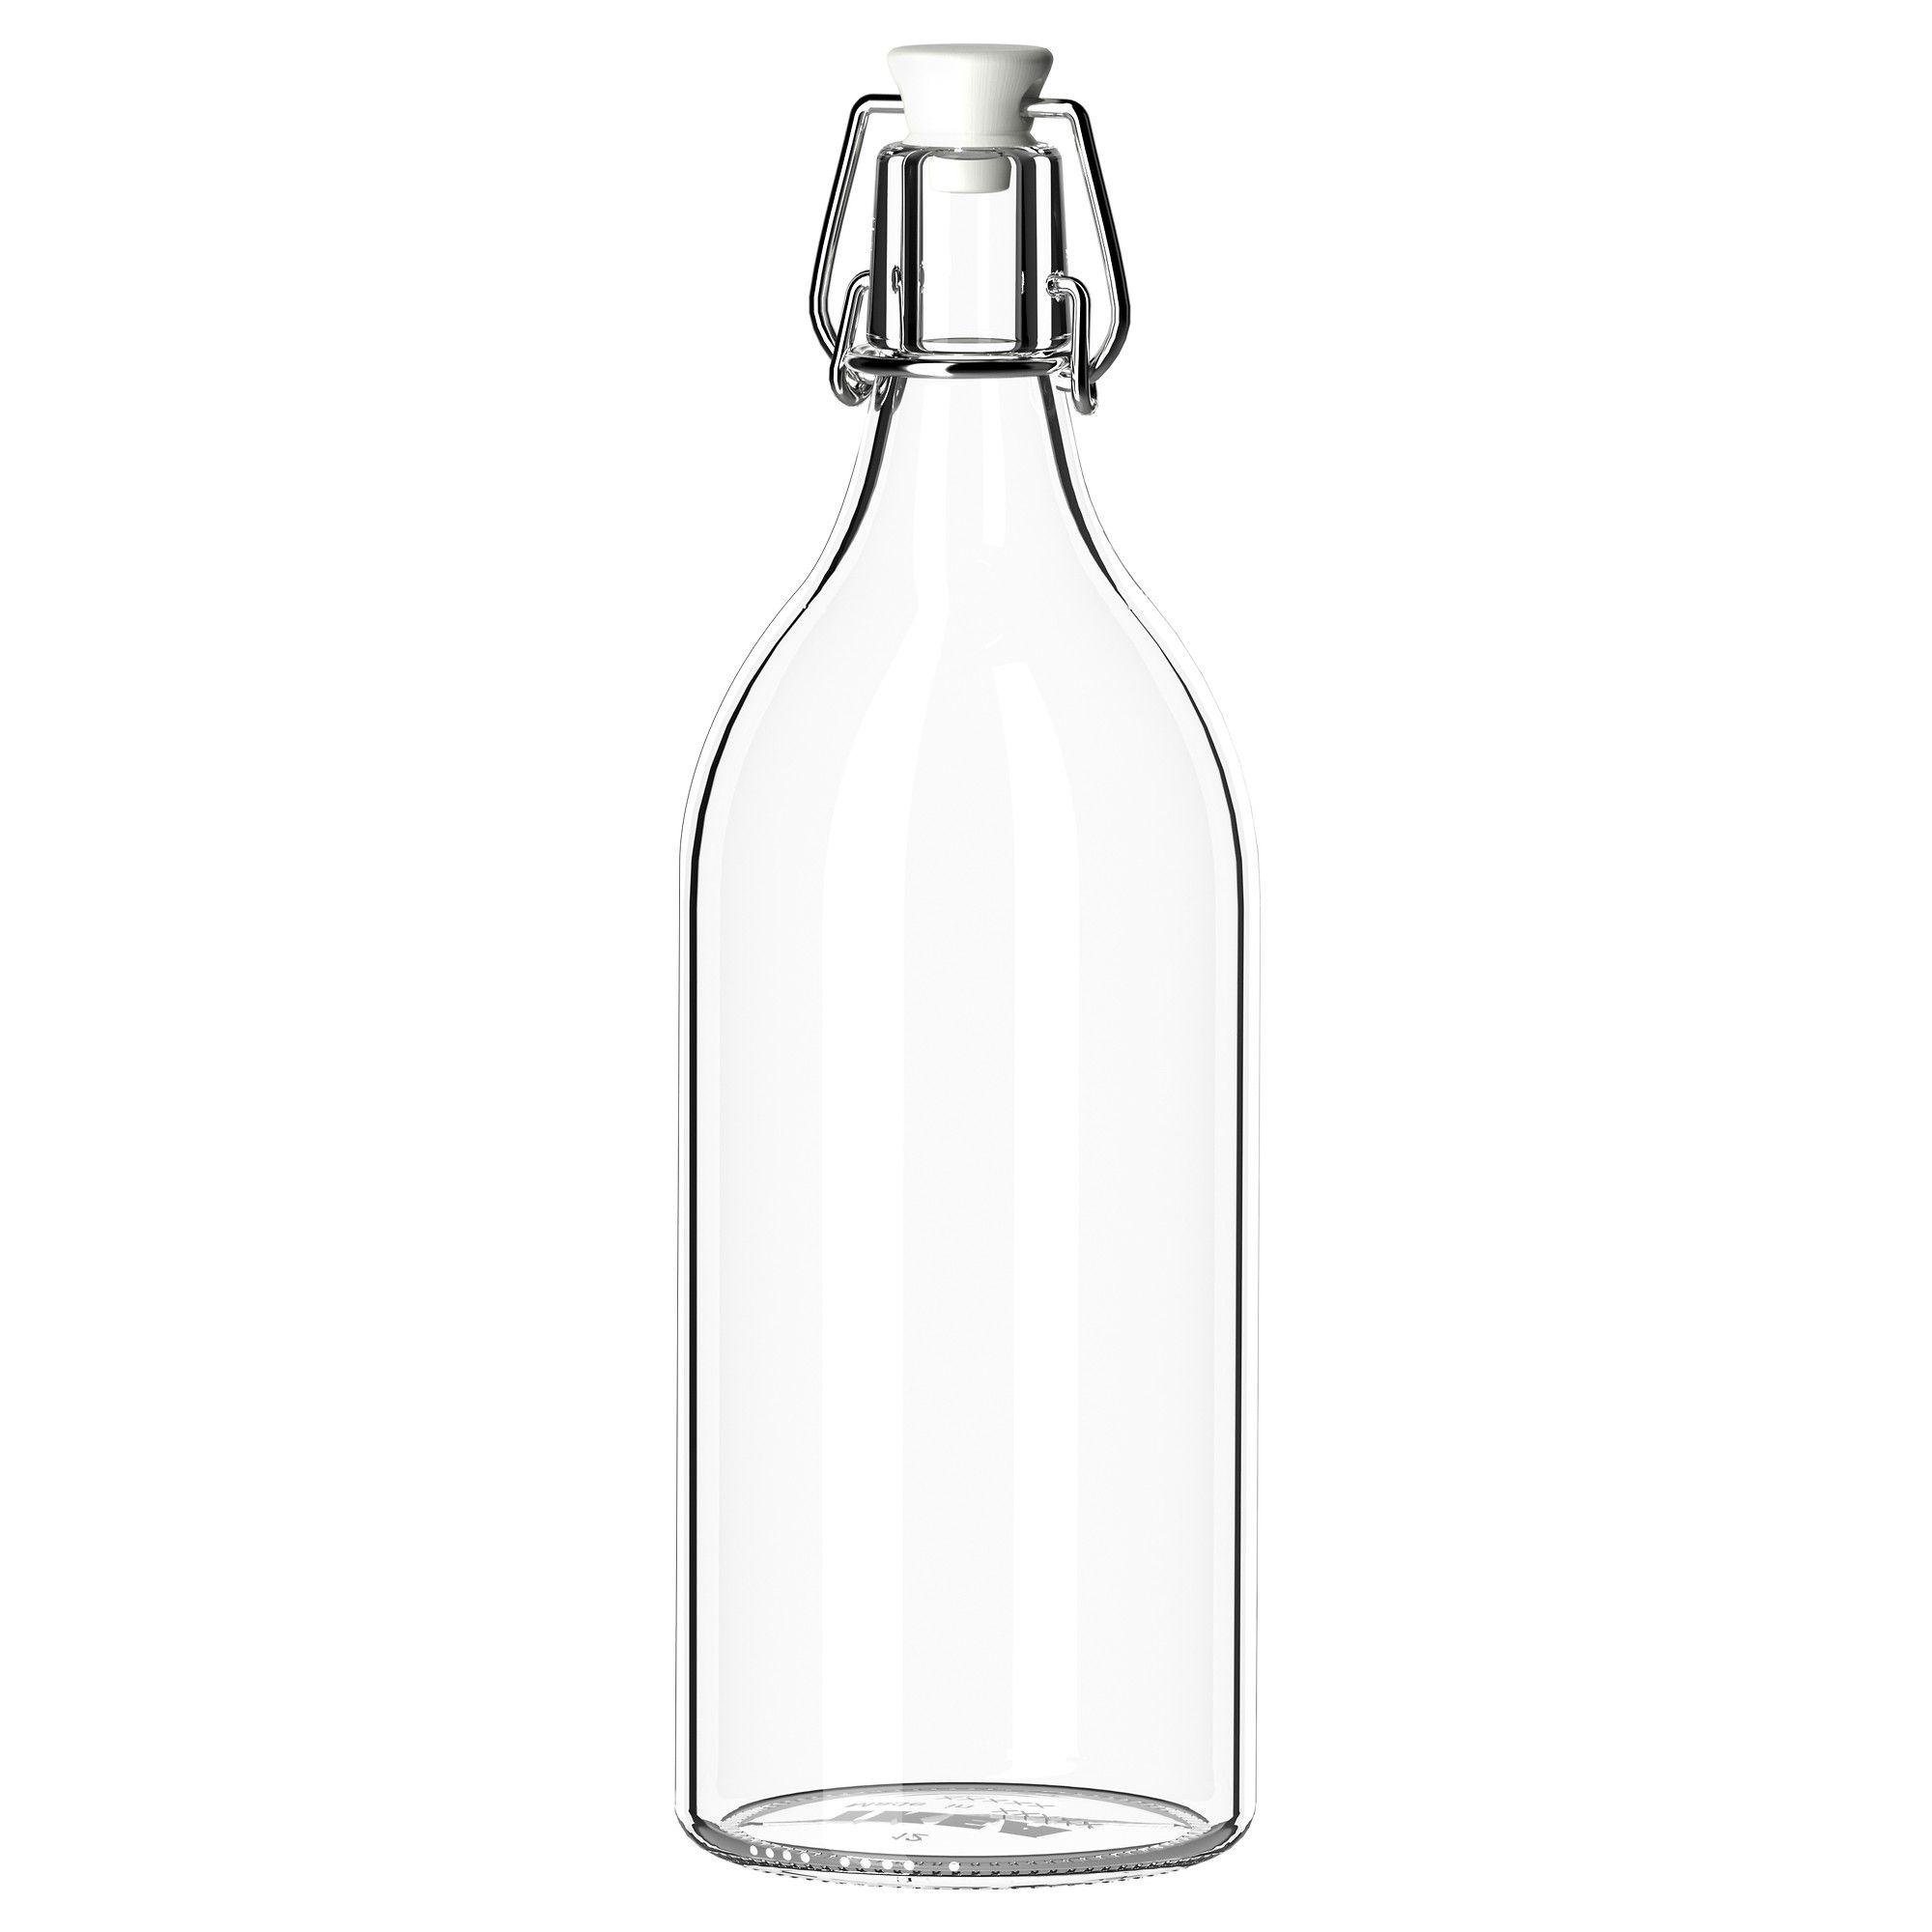 korken bouteille avec bouchon verre transparent inspiration midsommar our ikea wishlist. Black Bedroom Furniture Sets. Home Design Ideas